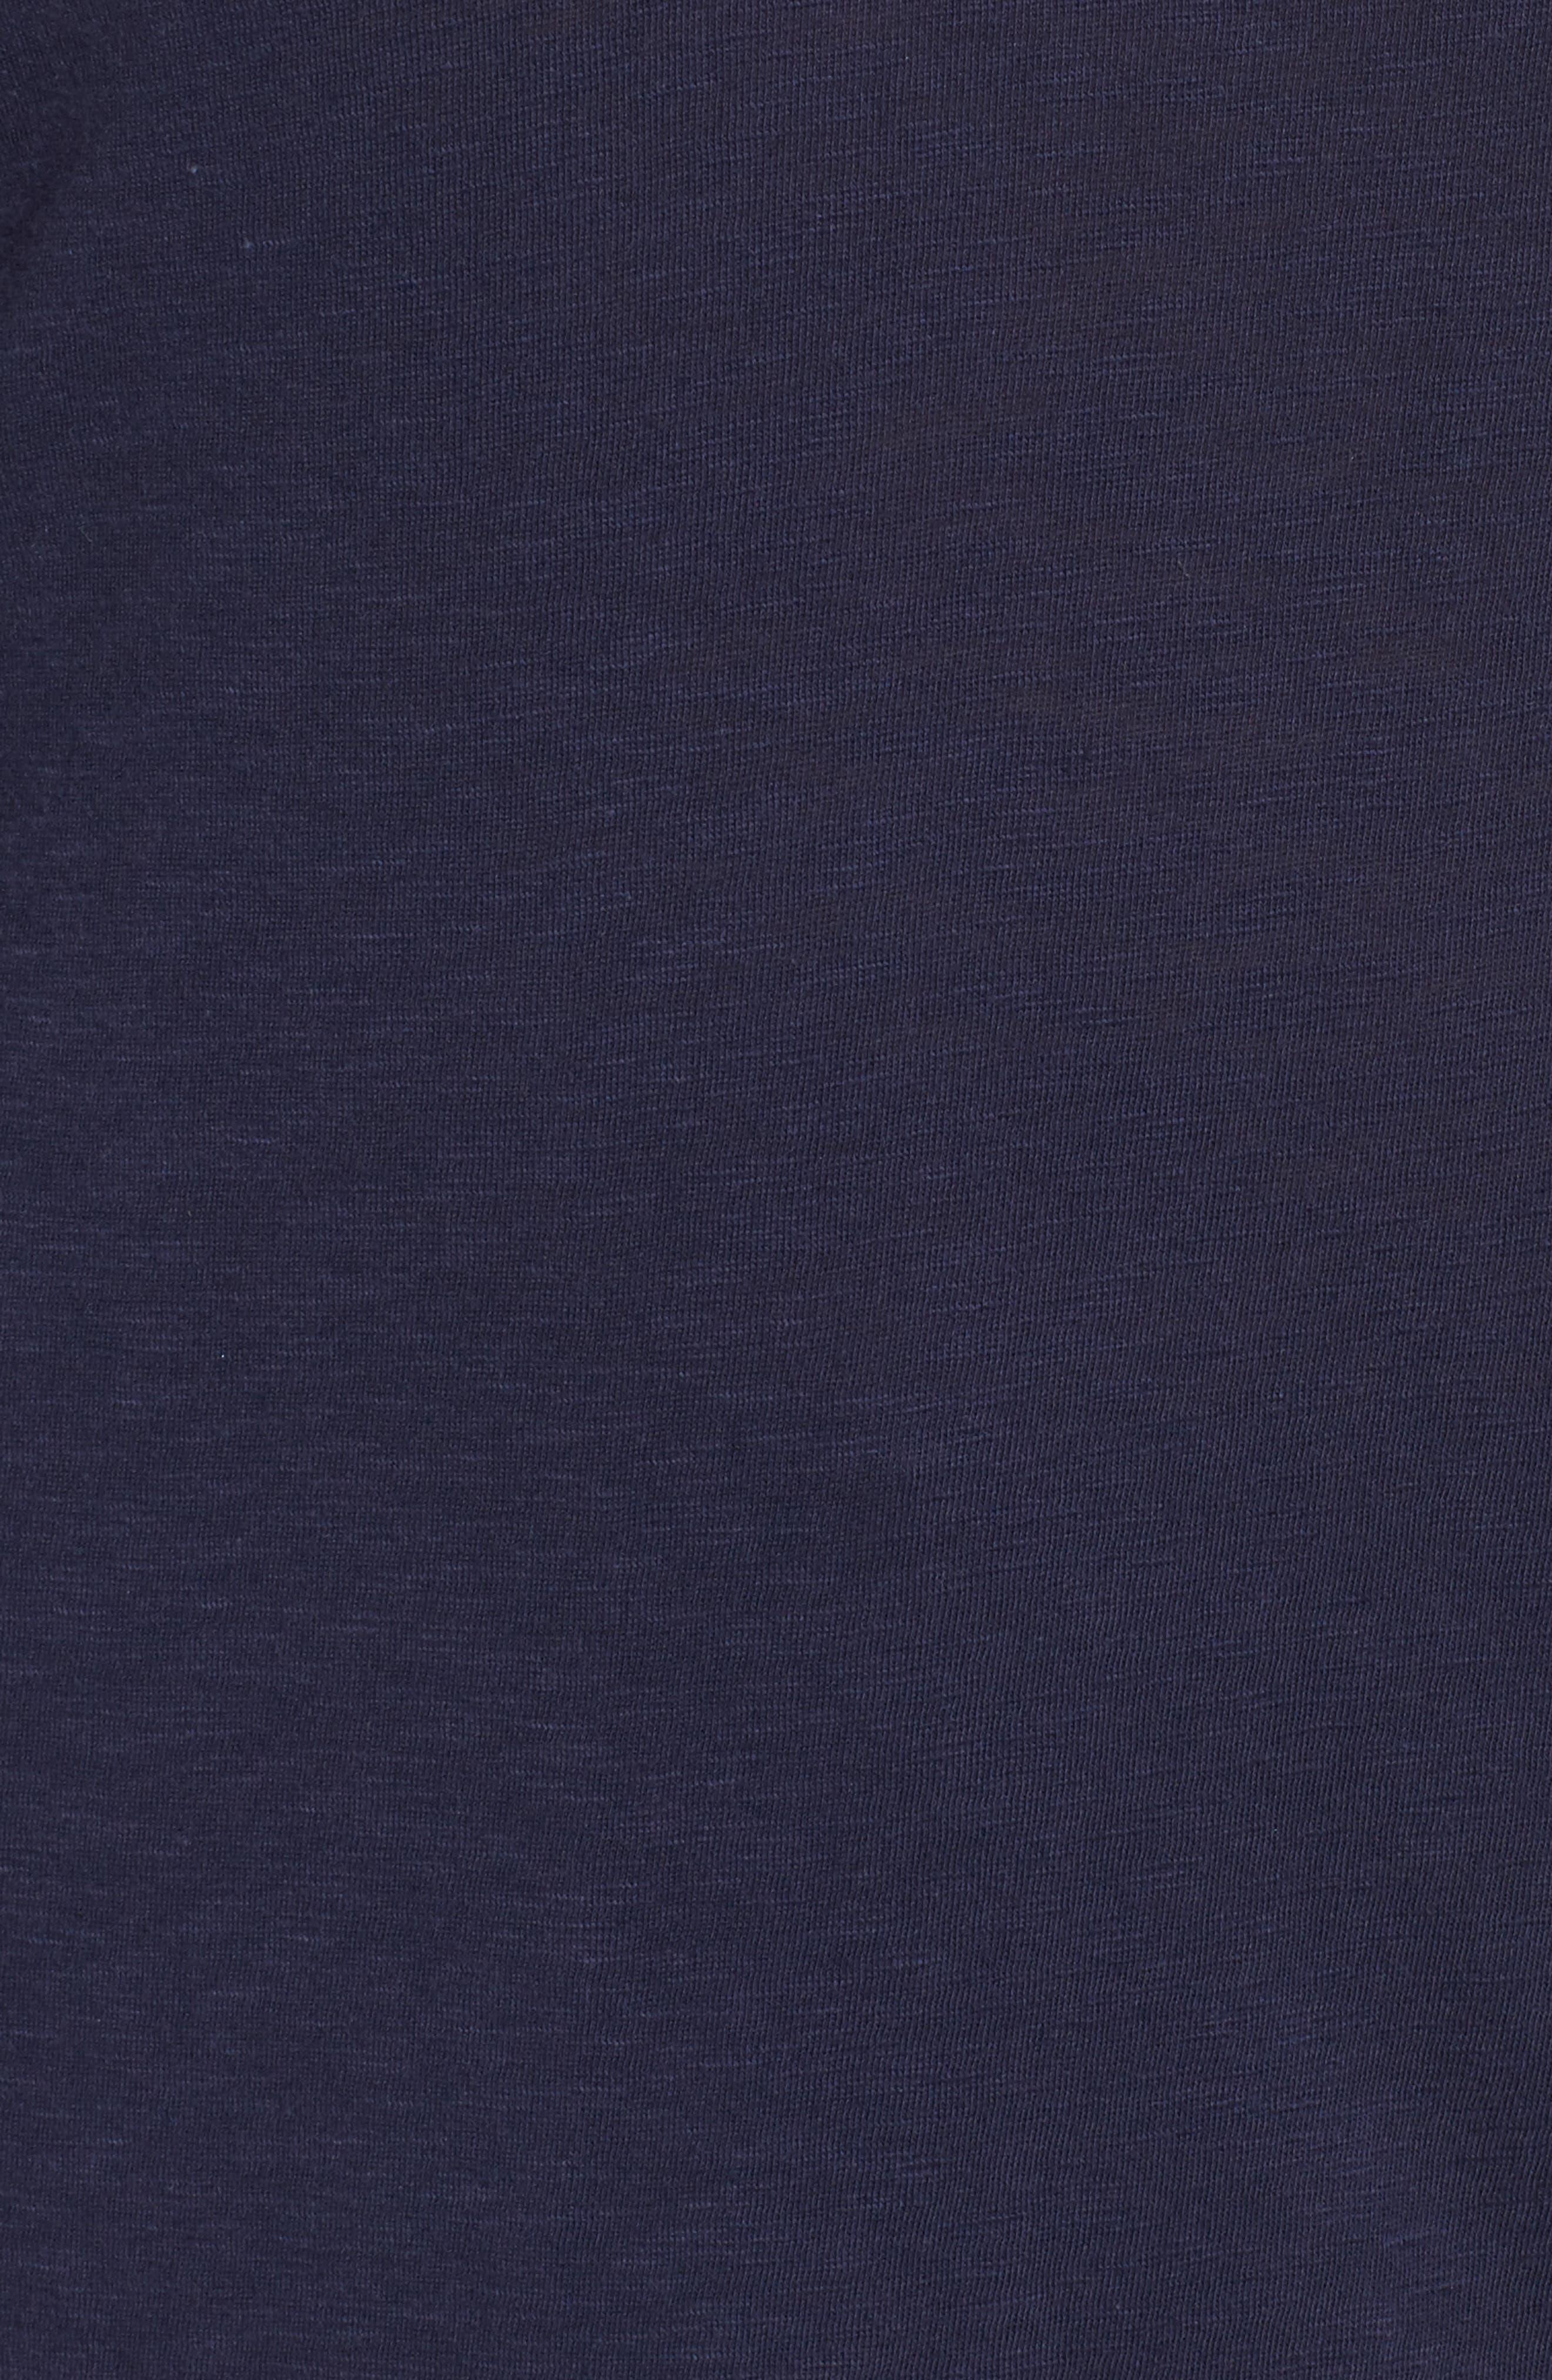 Long Sleeve Crewneck Tee,                             Alternate thumbnail 36, color,                             Navy Peacoat